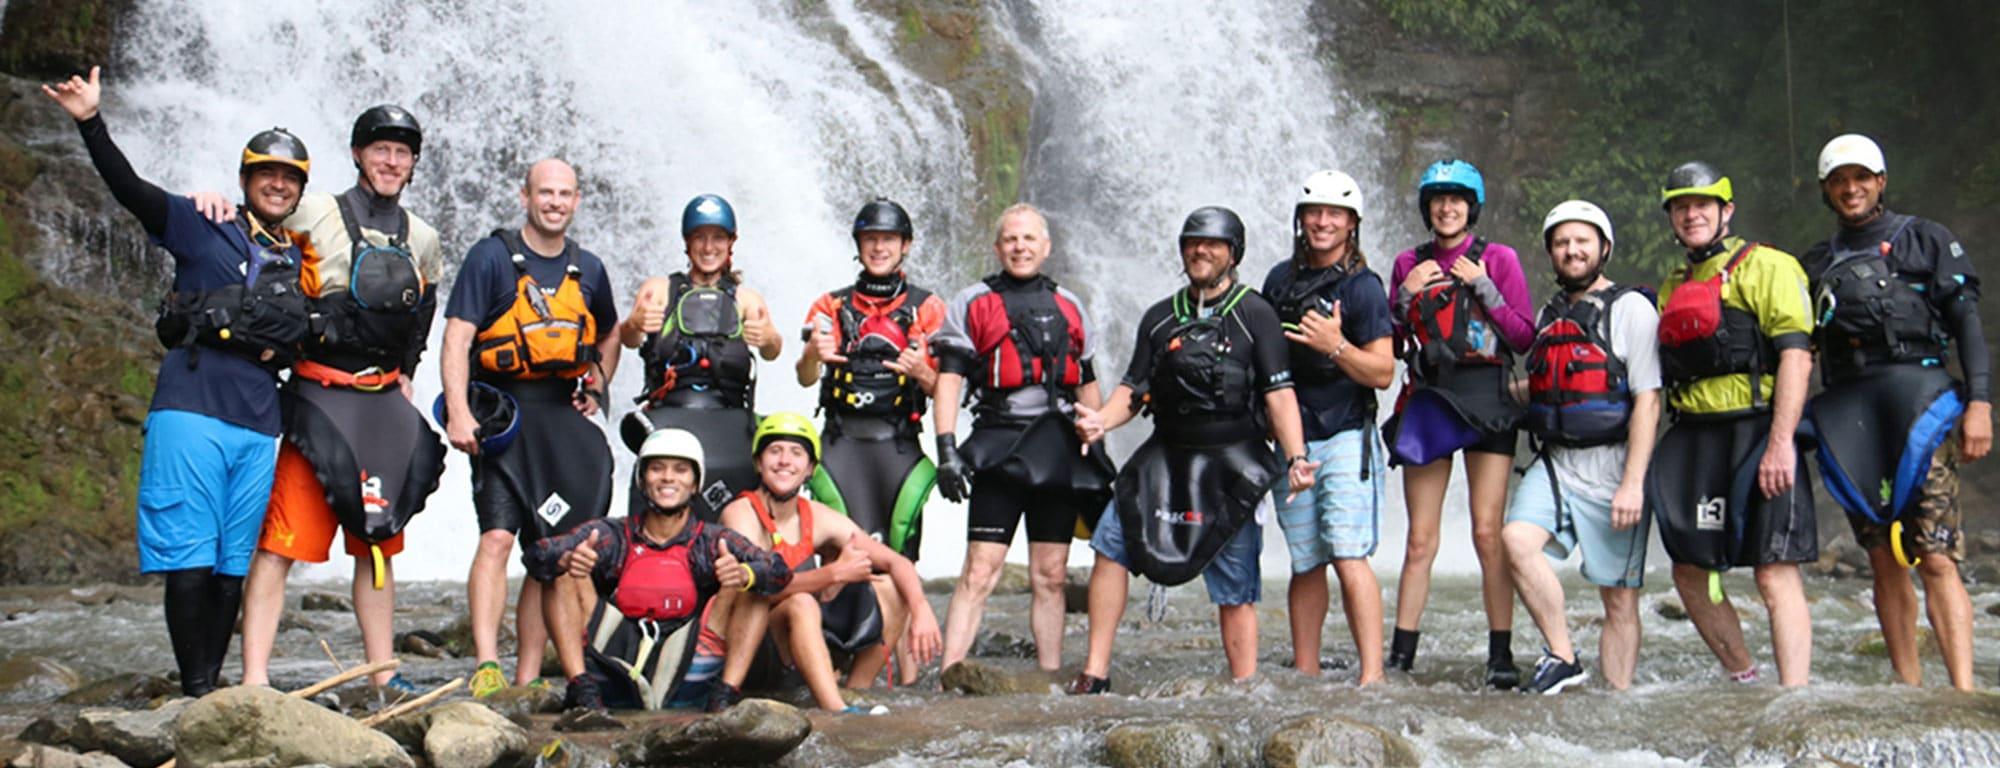 Sevegre River Waterfall Group Banner